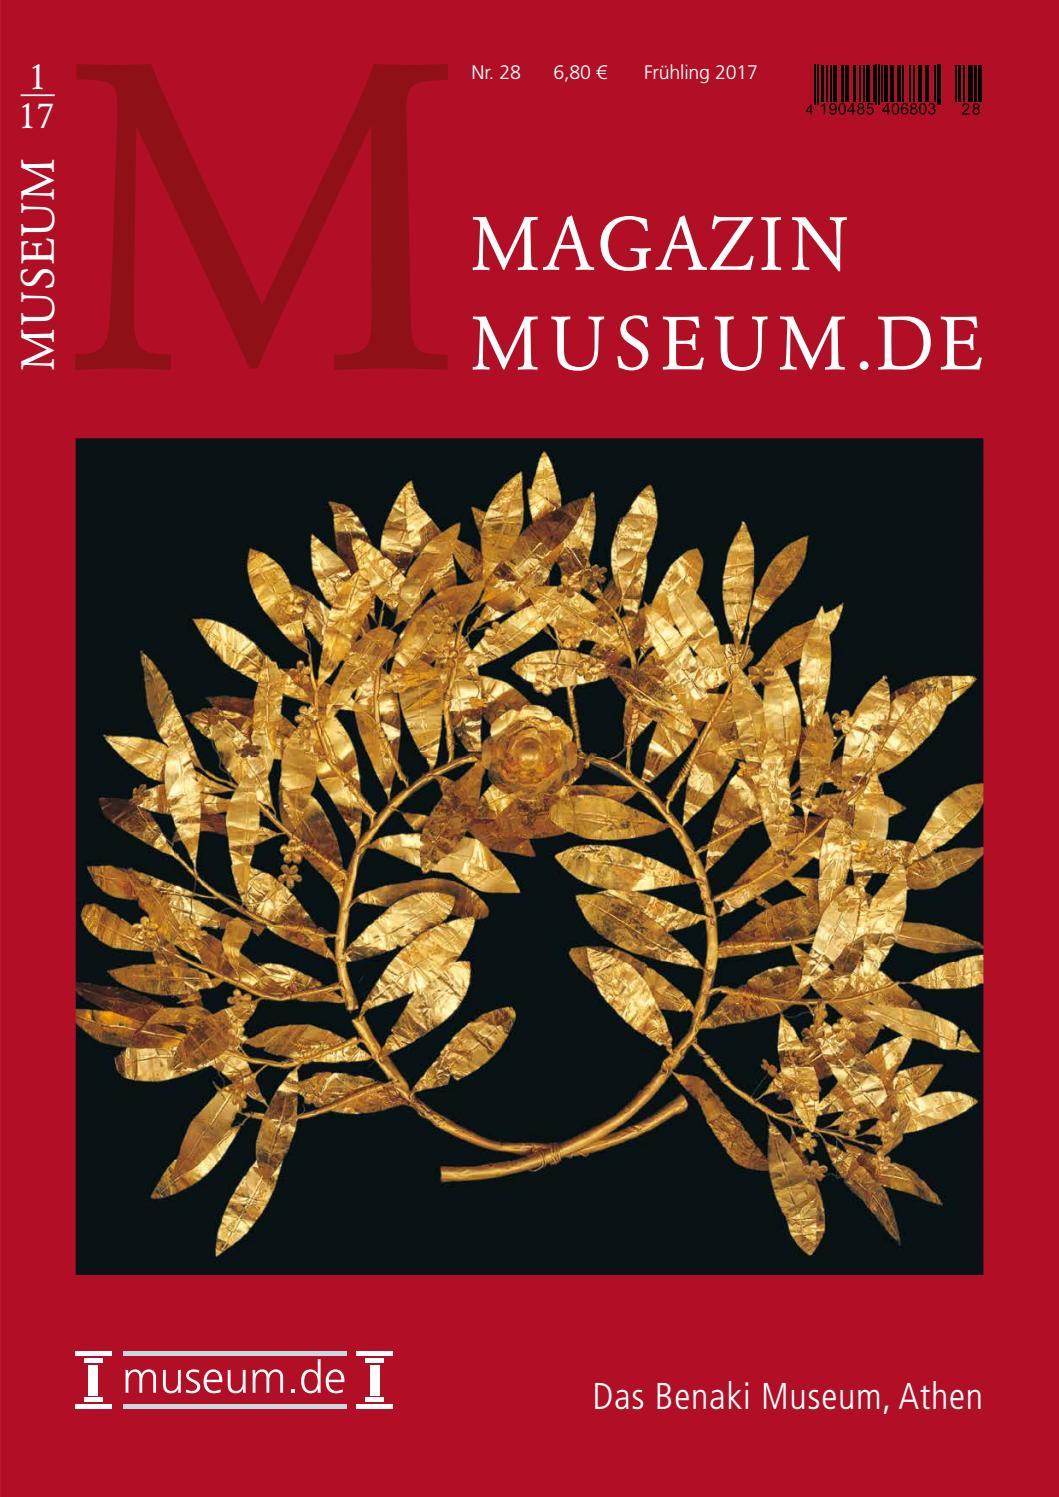 Magazin Museum.de Nr. 28 by museum.de - issuu